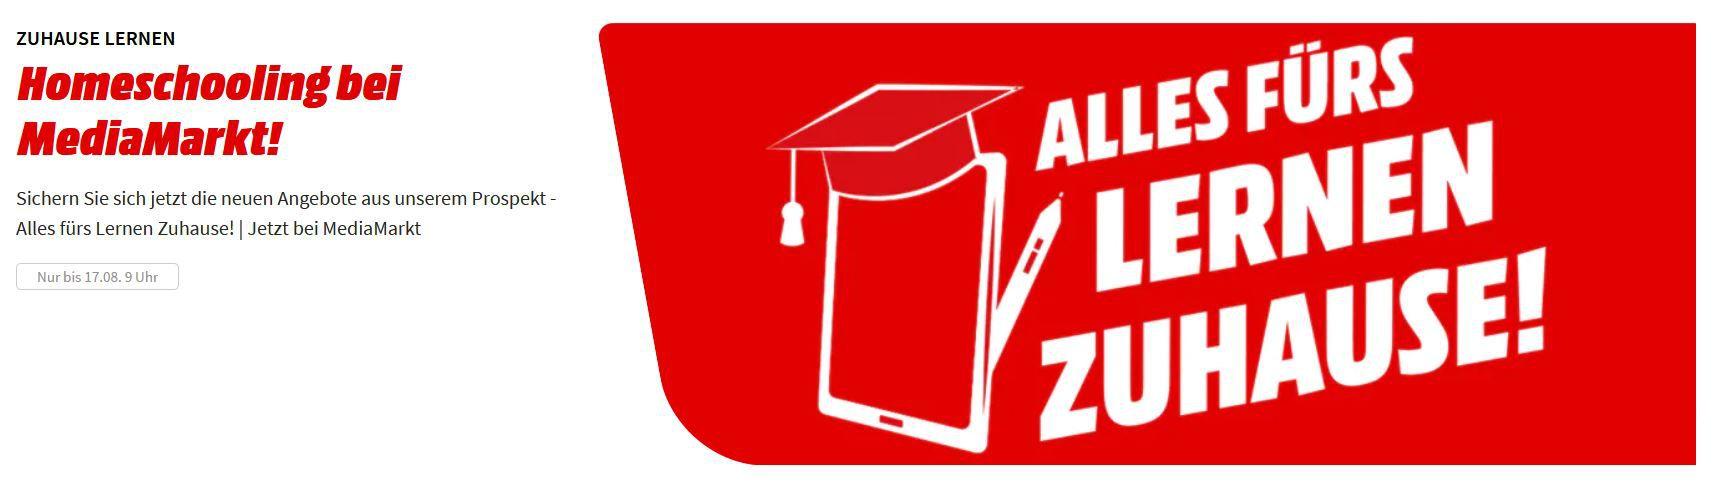 Media Markt Home Schooling Aktion: z.B. MSI Optix 27 Zoll WQHD Monitor ab 336,05€ (statt 385€)